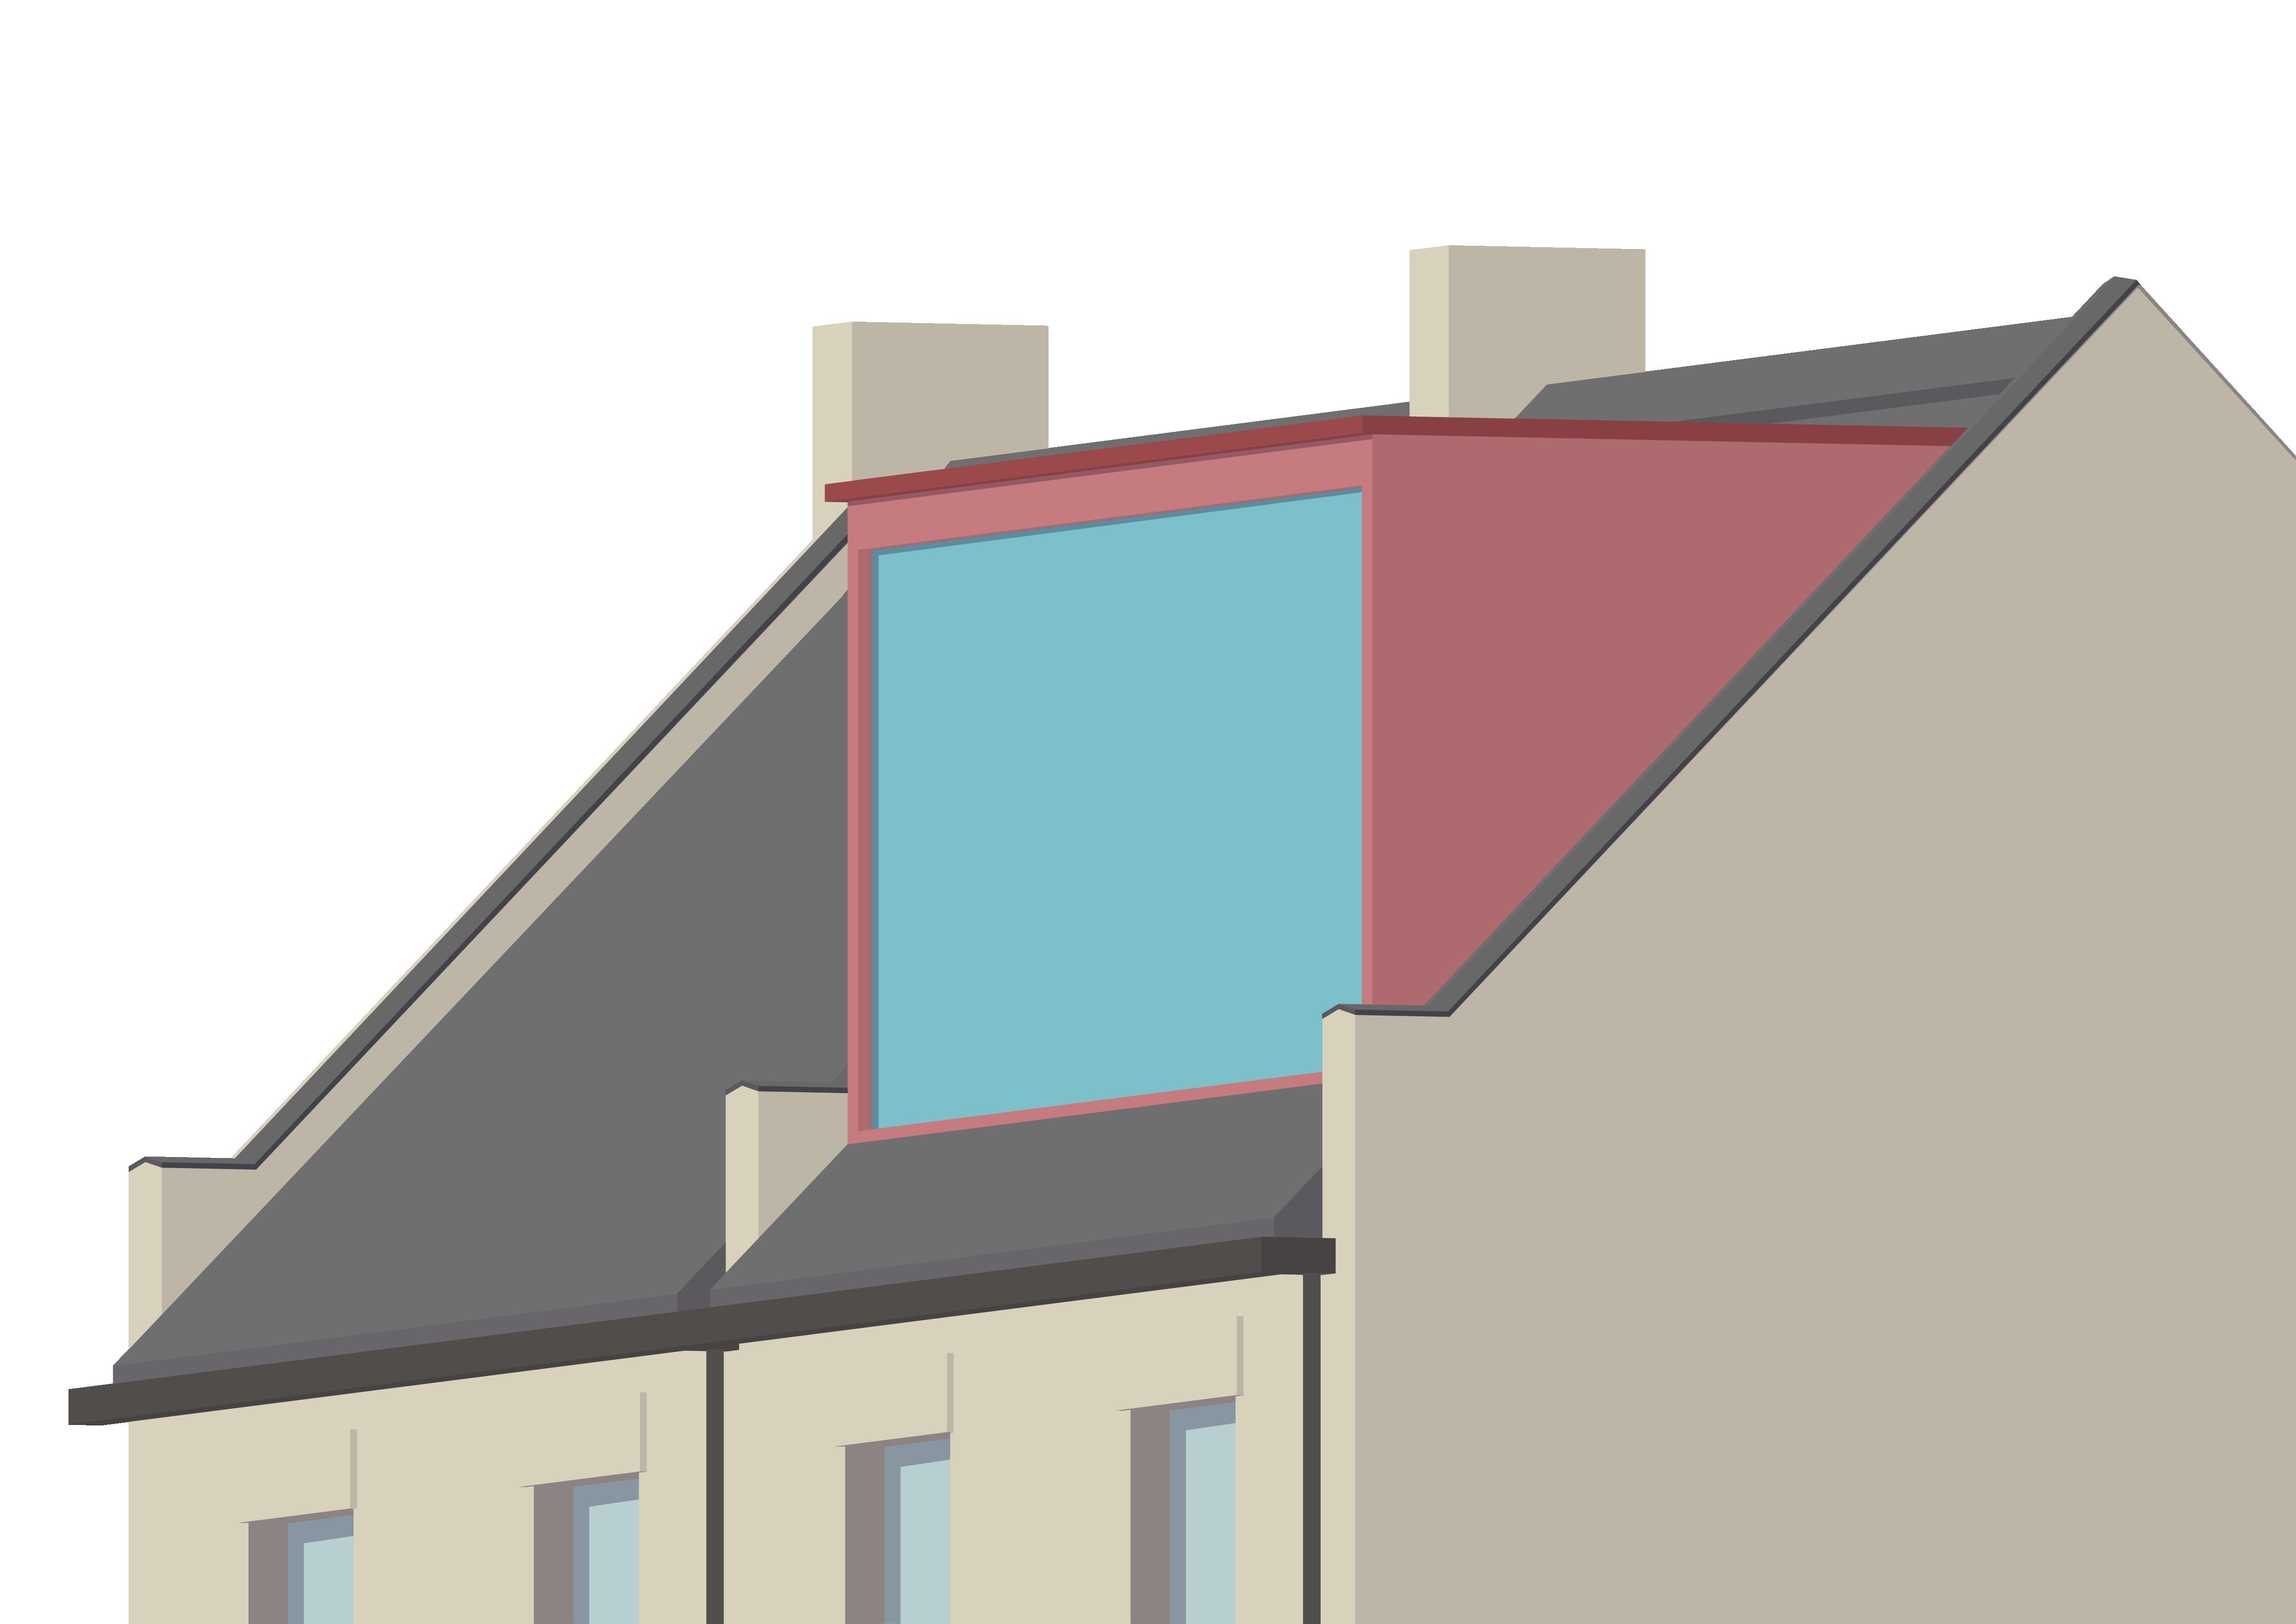 A modern rear dormer loft conversion on a terraced house